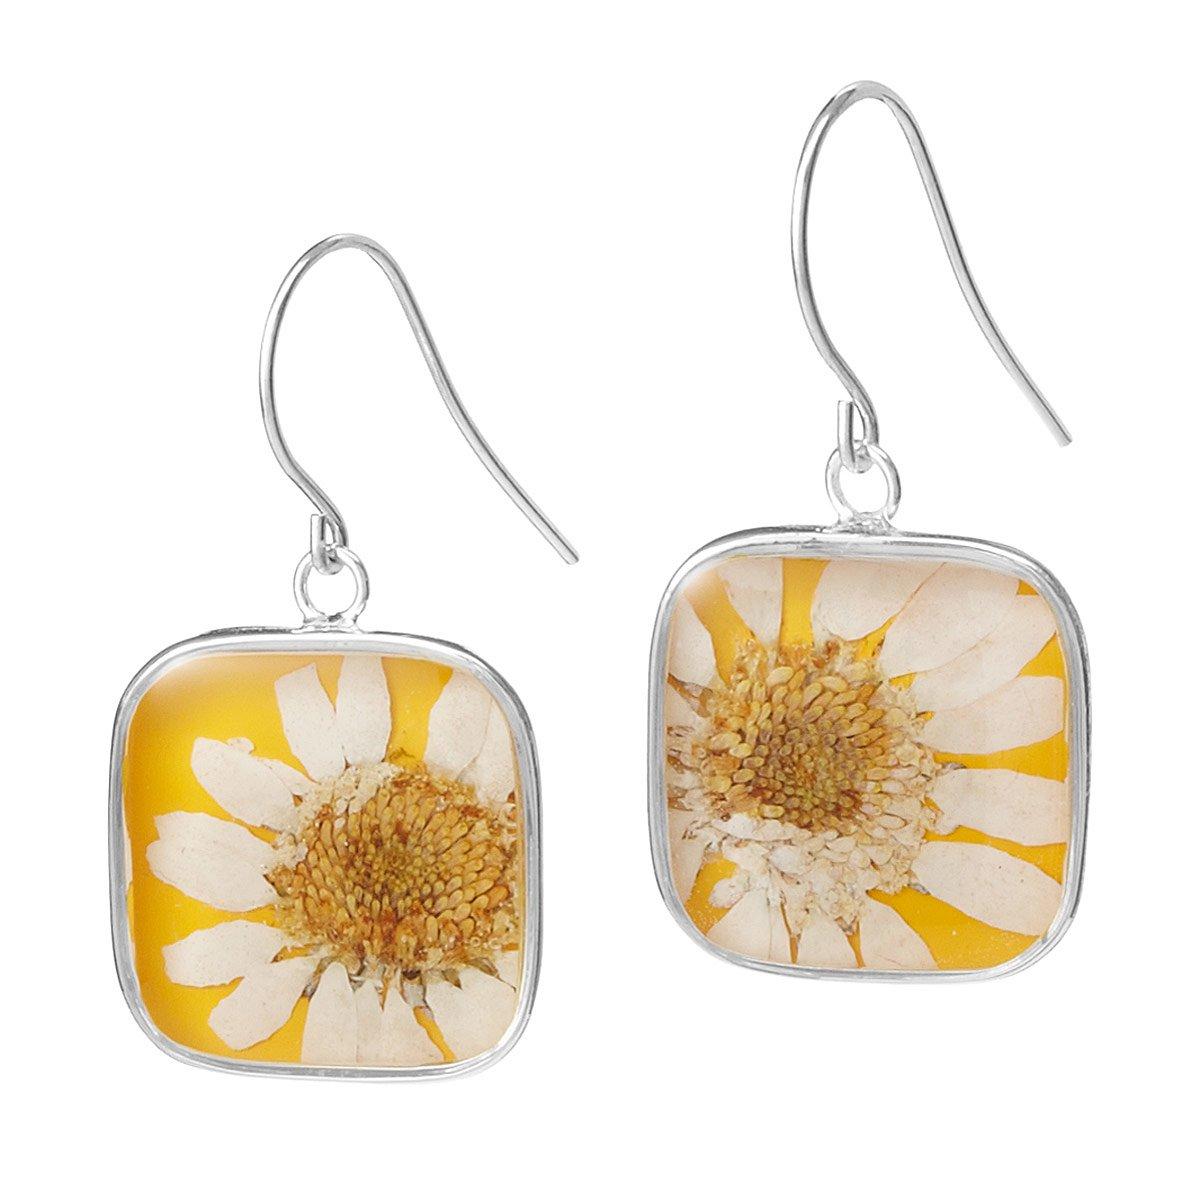 Birth month flower earrings birthday jewelry uncommongoods birth month flower earrings 1 thumbnail izmirmasajfo Images